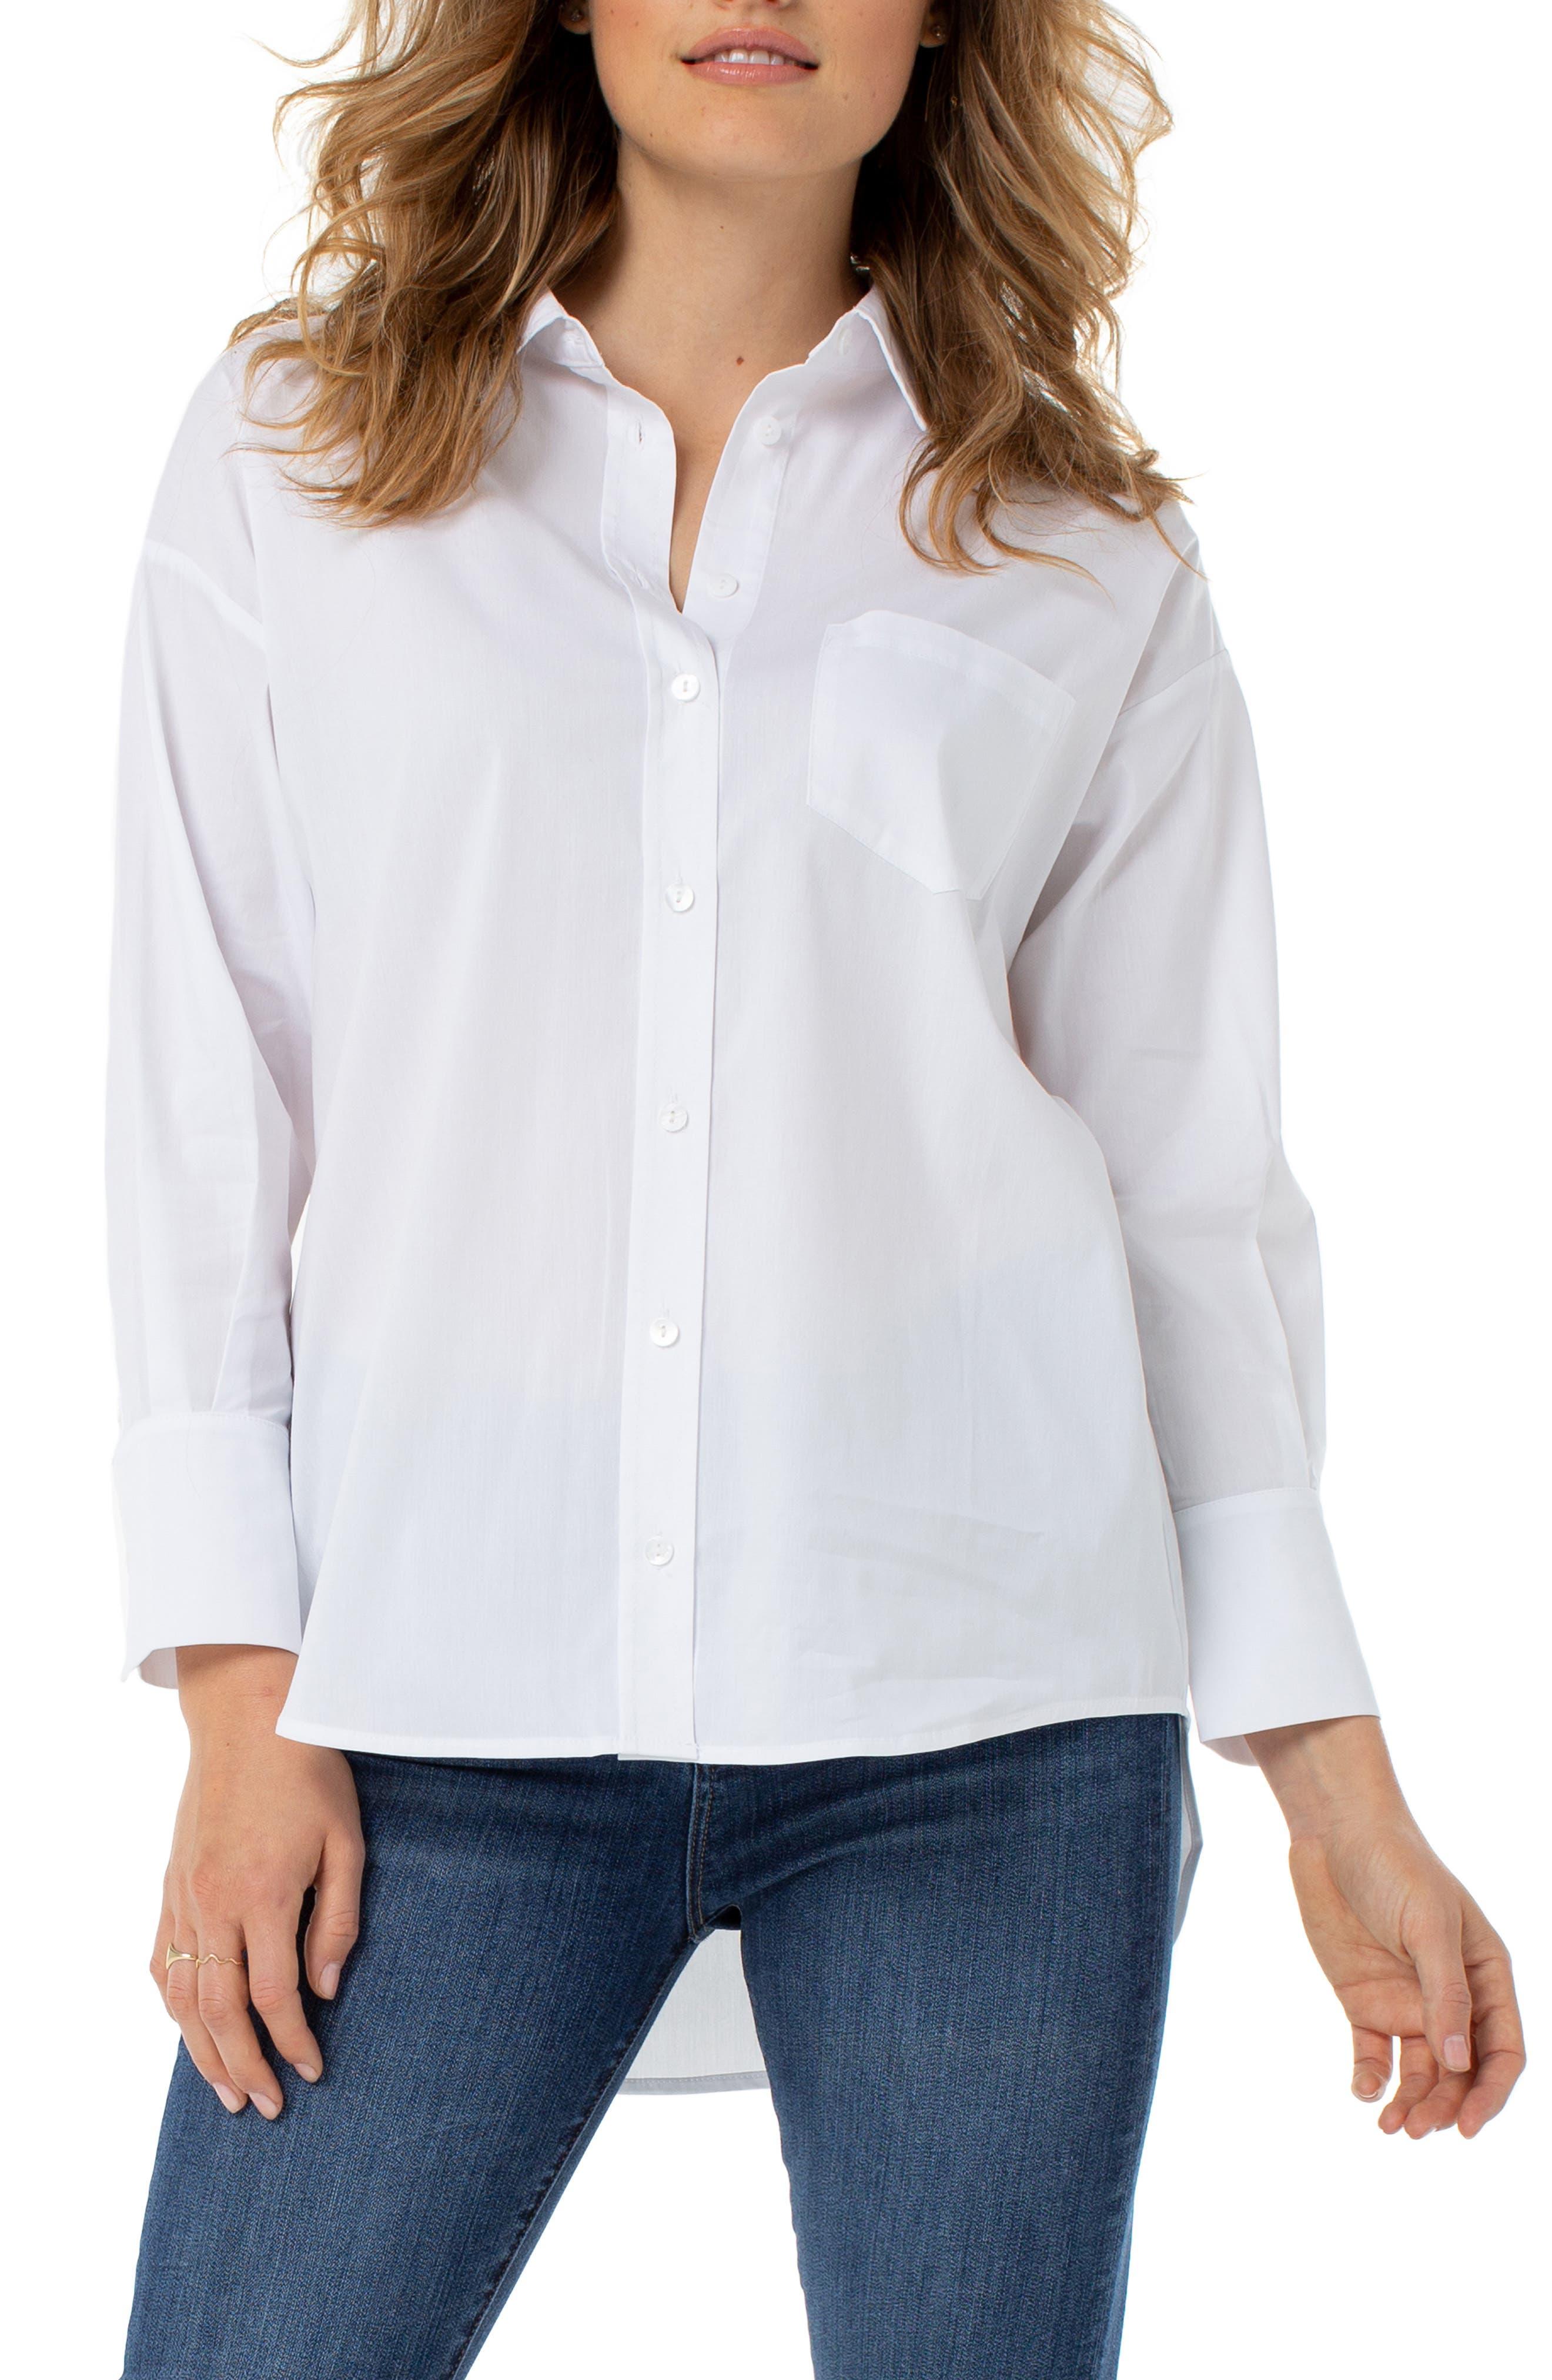 Oversize Classic Button-Up Shirt